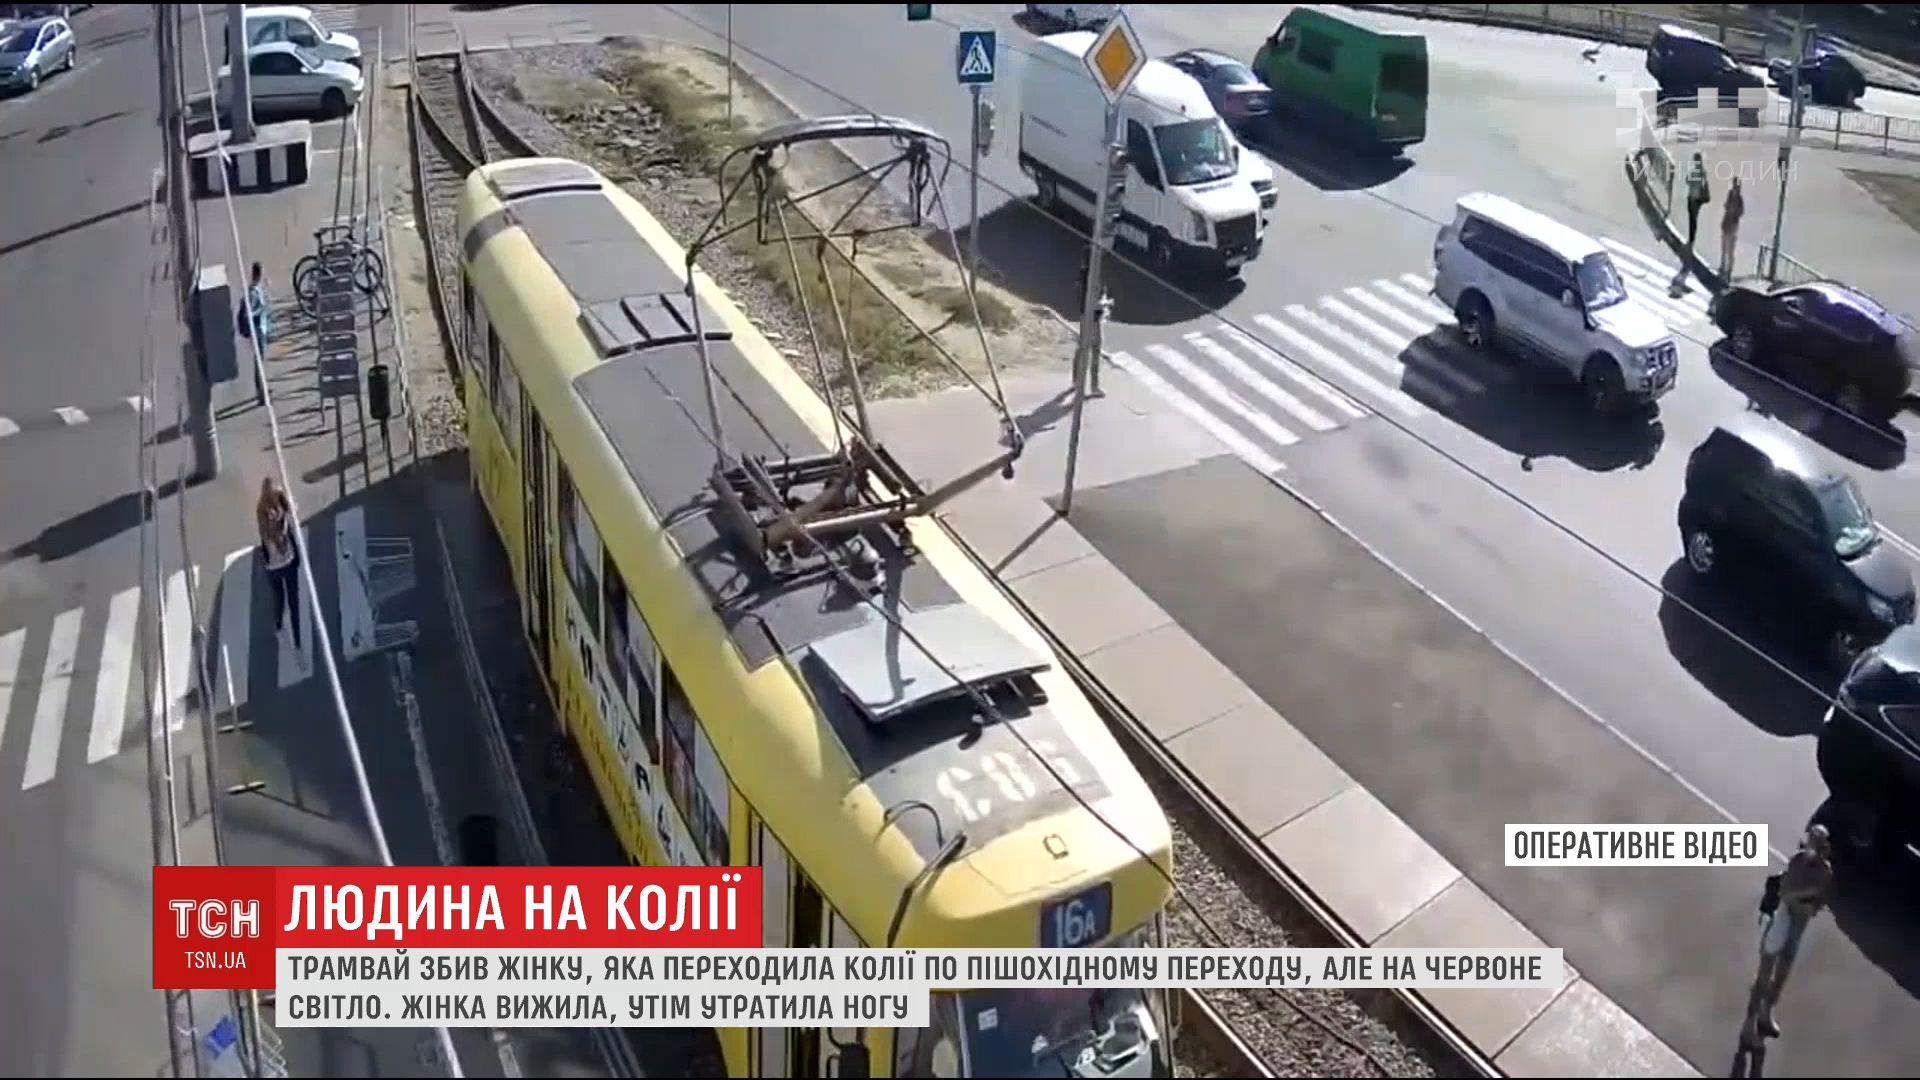 Мужчина попал под трамвай смотреть видео